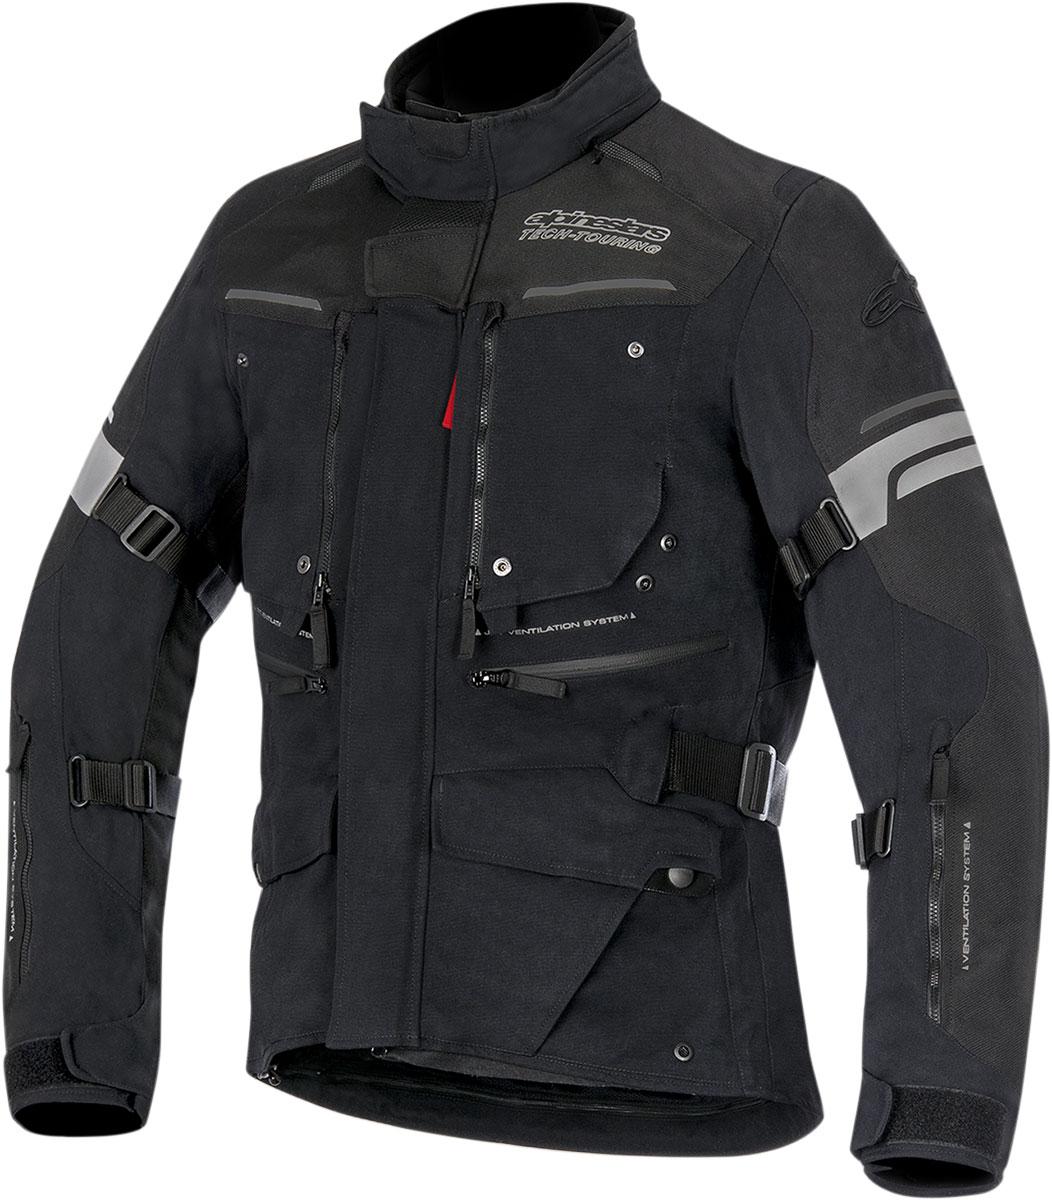 Alpinestars VALPARAISO 2 Drystar Adventure Touring Jacket (Black/Anthracite)